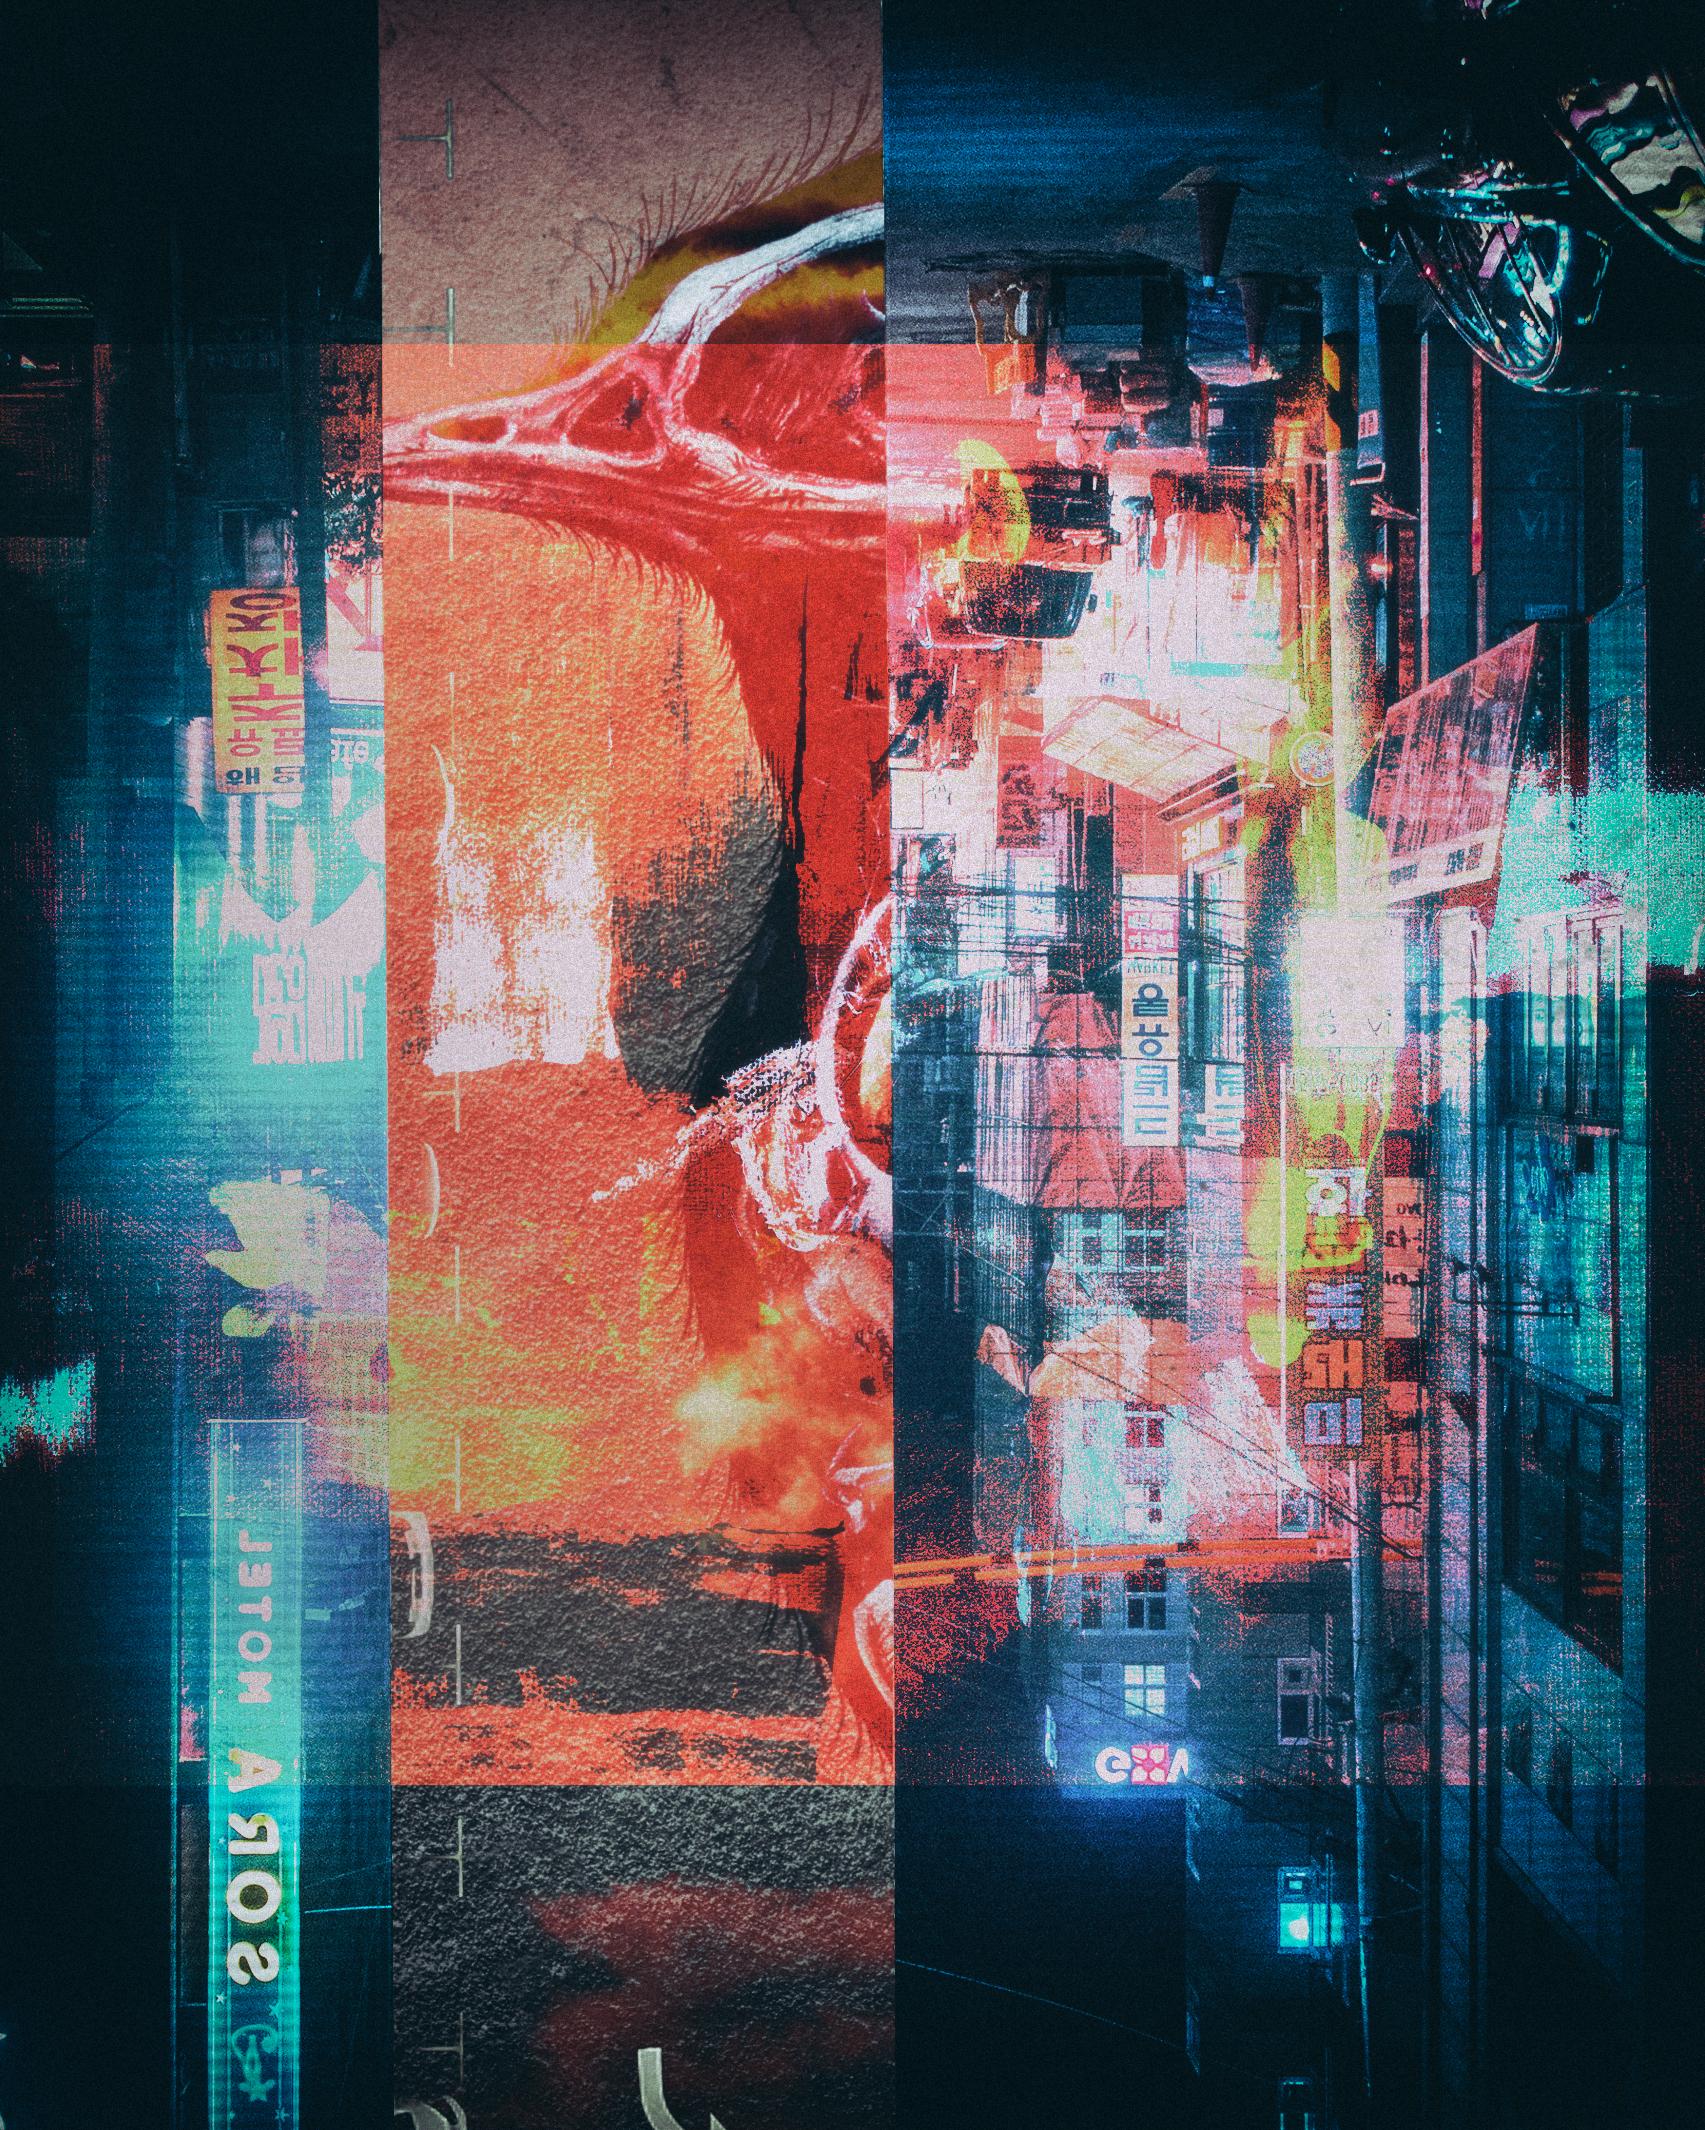 T.KYO! 0.3 - 06-08-18